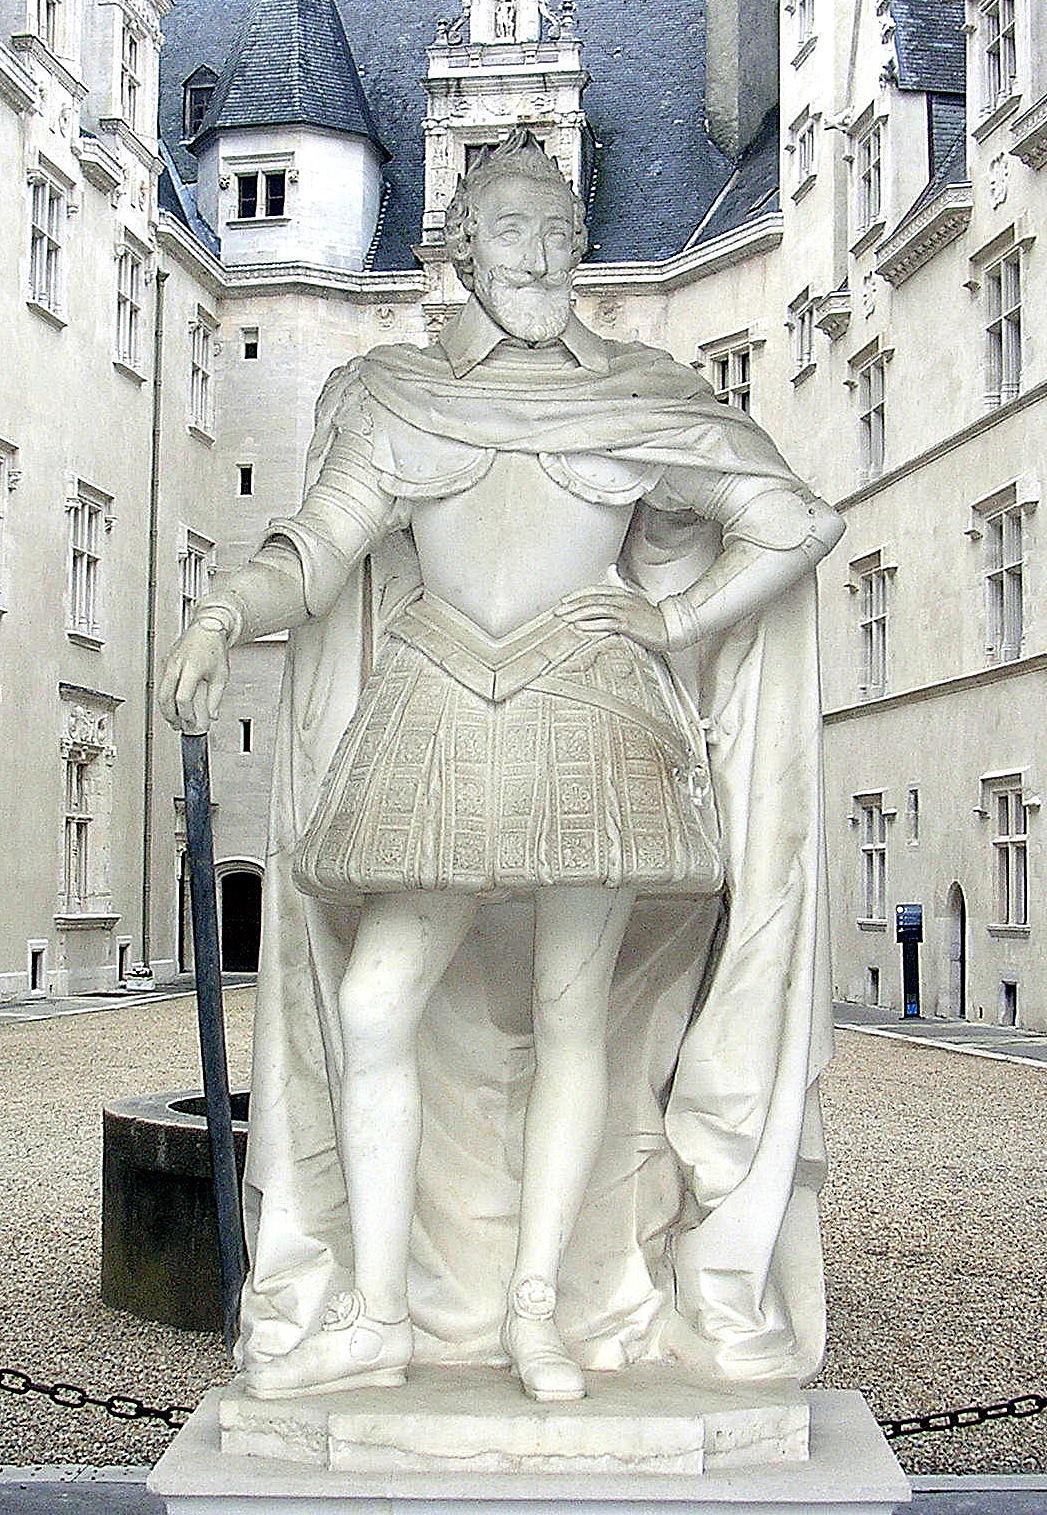 http://upload.wikimedia.org/wikipedia/commons/c/c3/Henri_IV_Pau.JPG